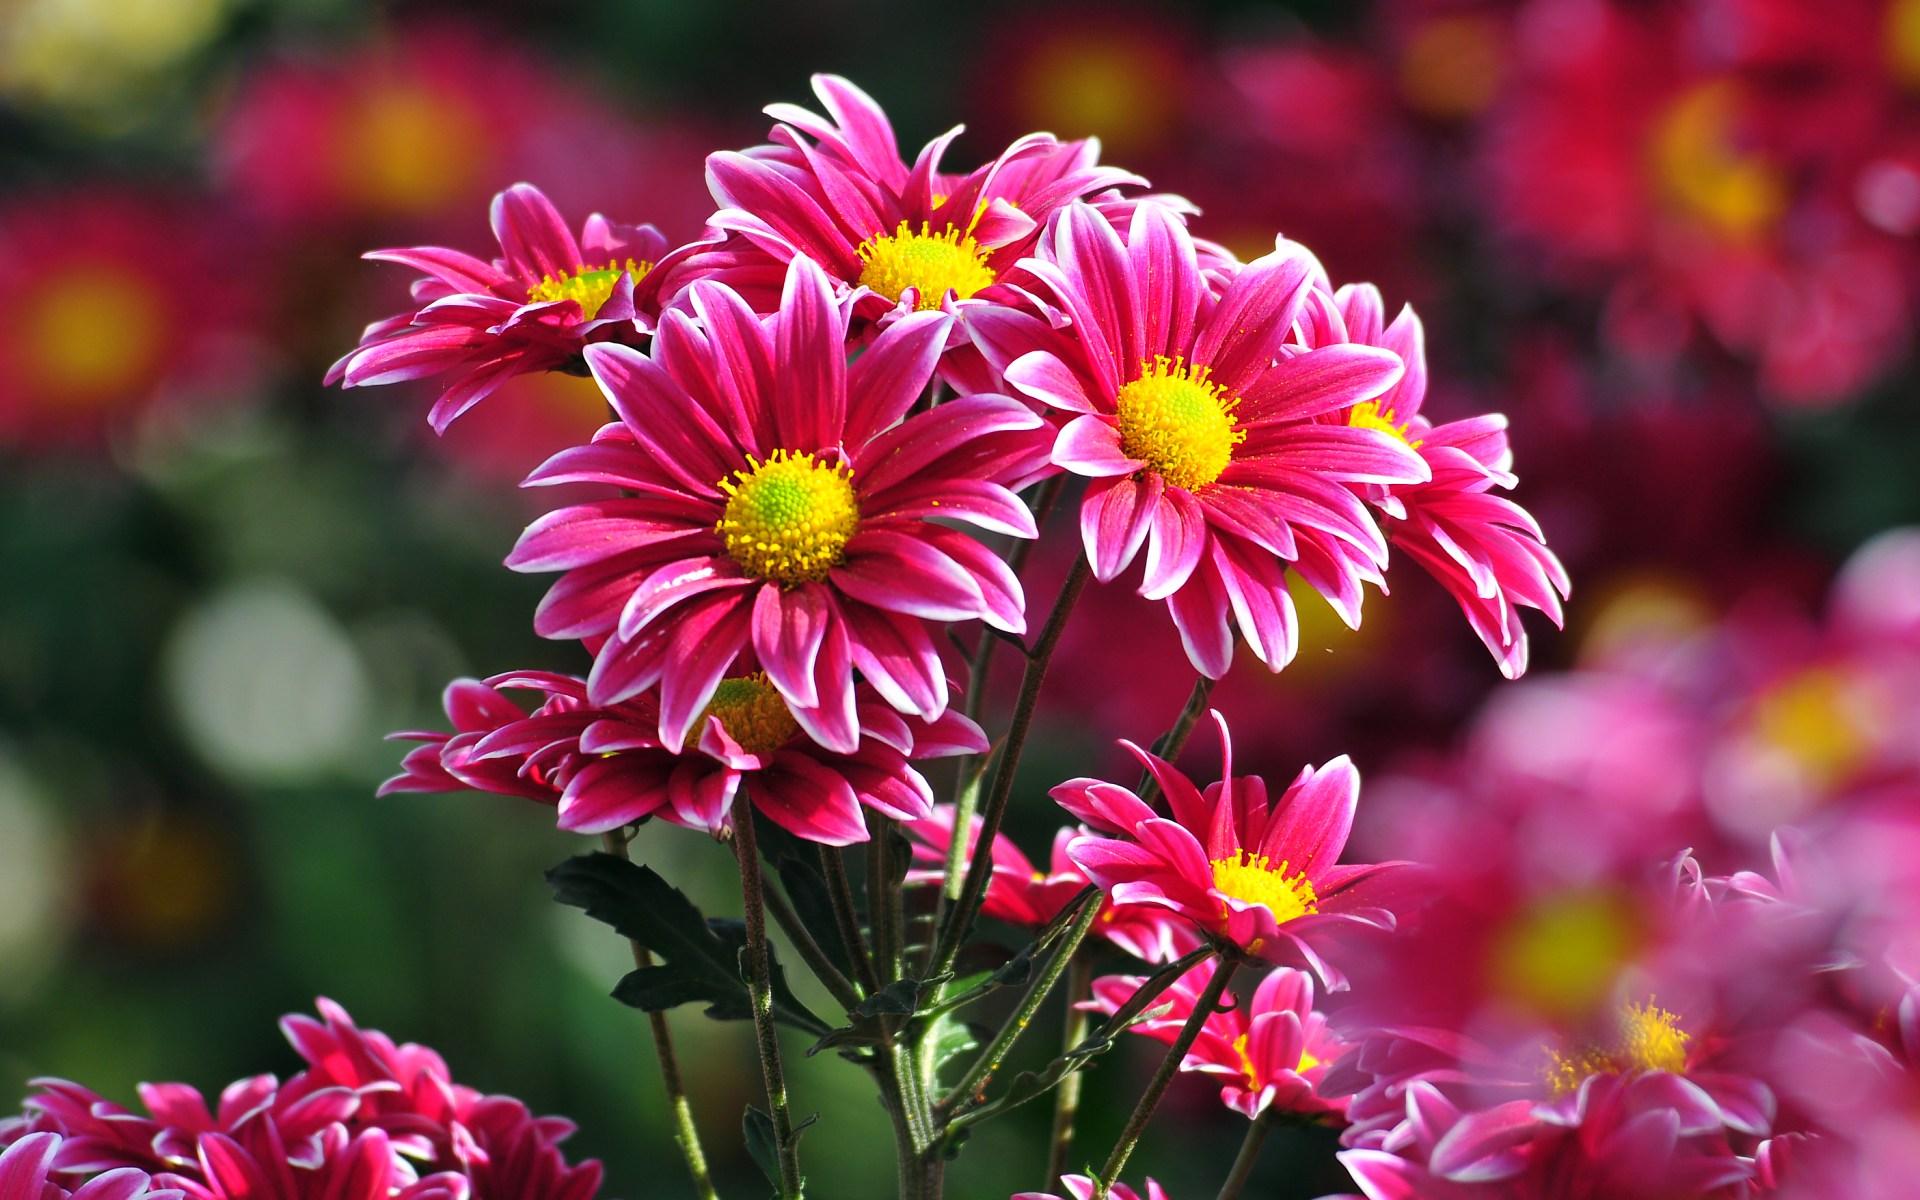 Beautiful flower nature hd desktop wallpapers 4k hd - Beautiful flower images wallpapers ...